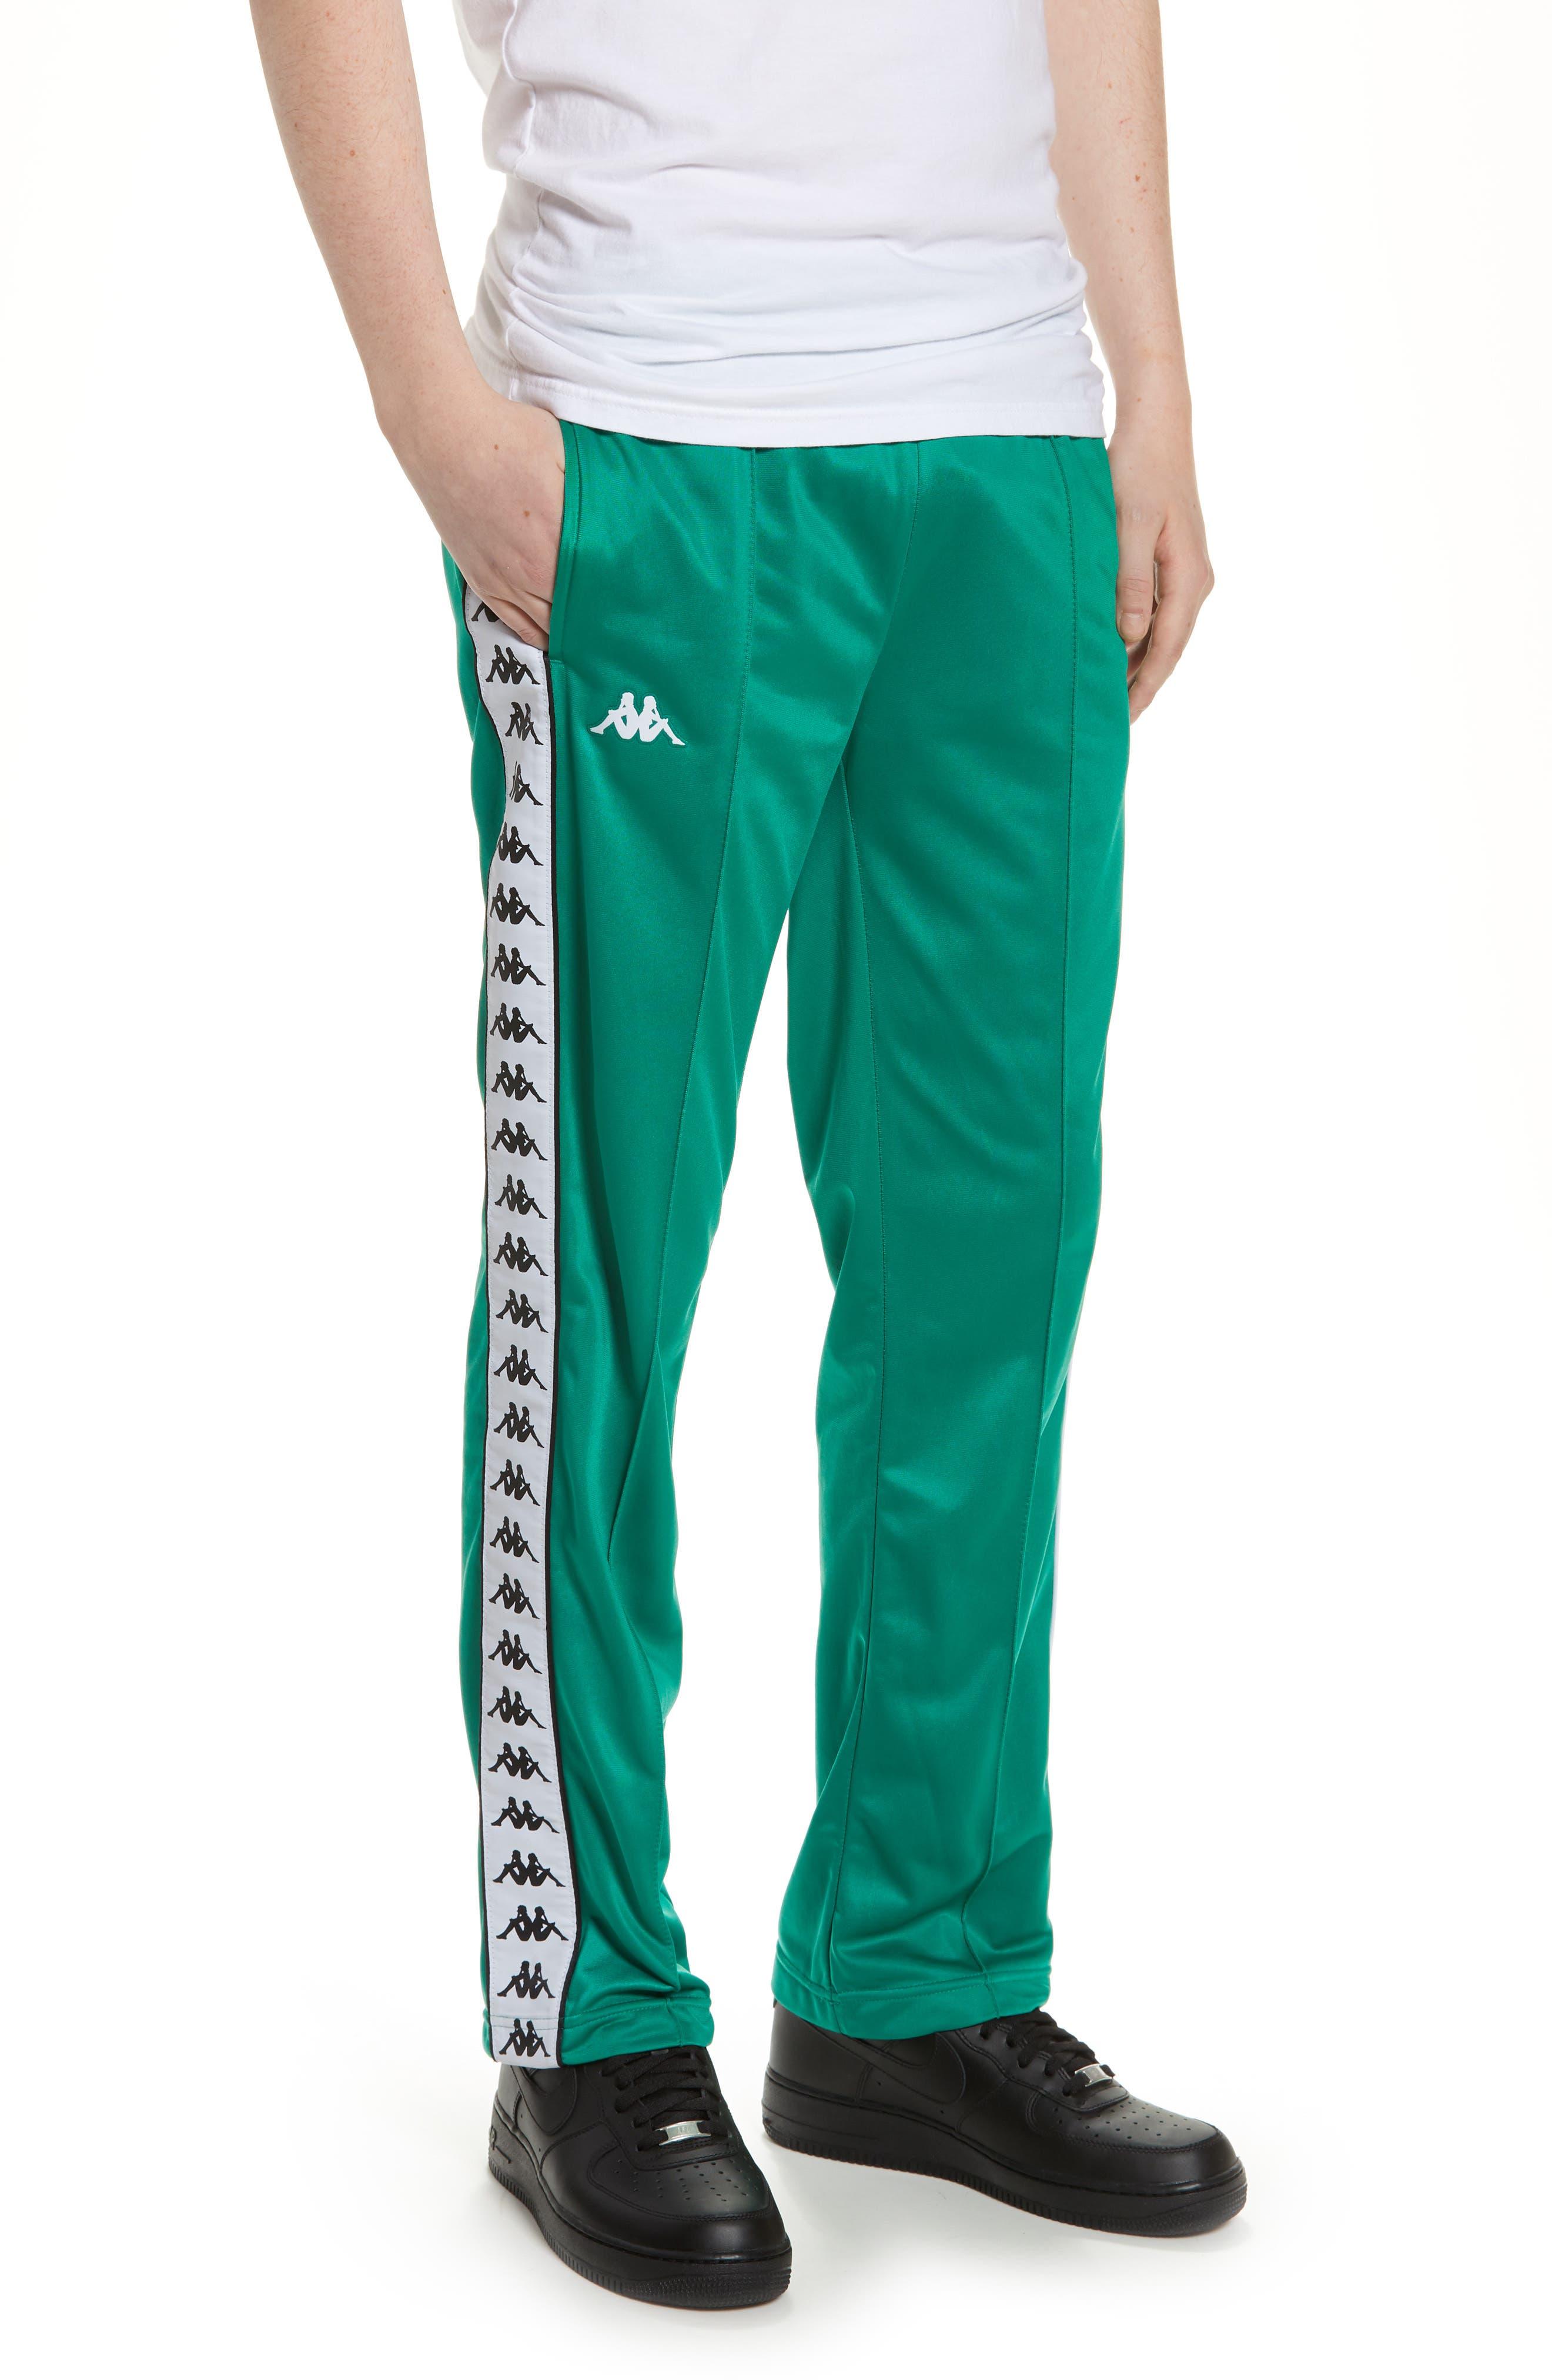 Active 222 Banda Astoriazz Slim Track Pants, Main, color, GREEN/ BLACK/ WHITE